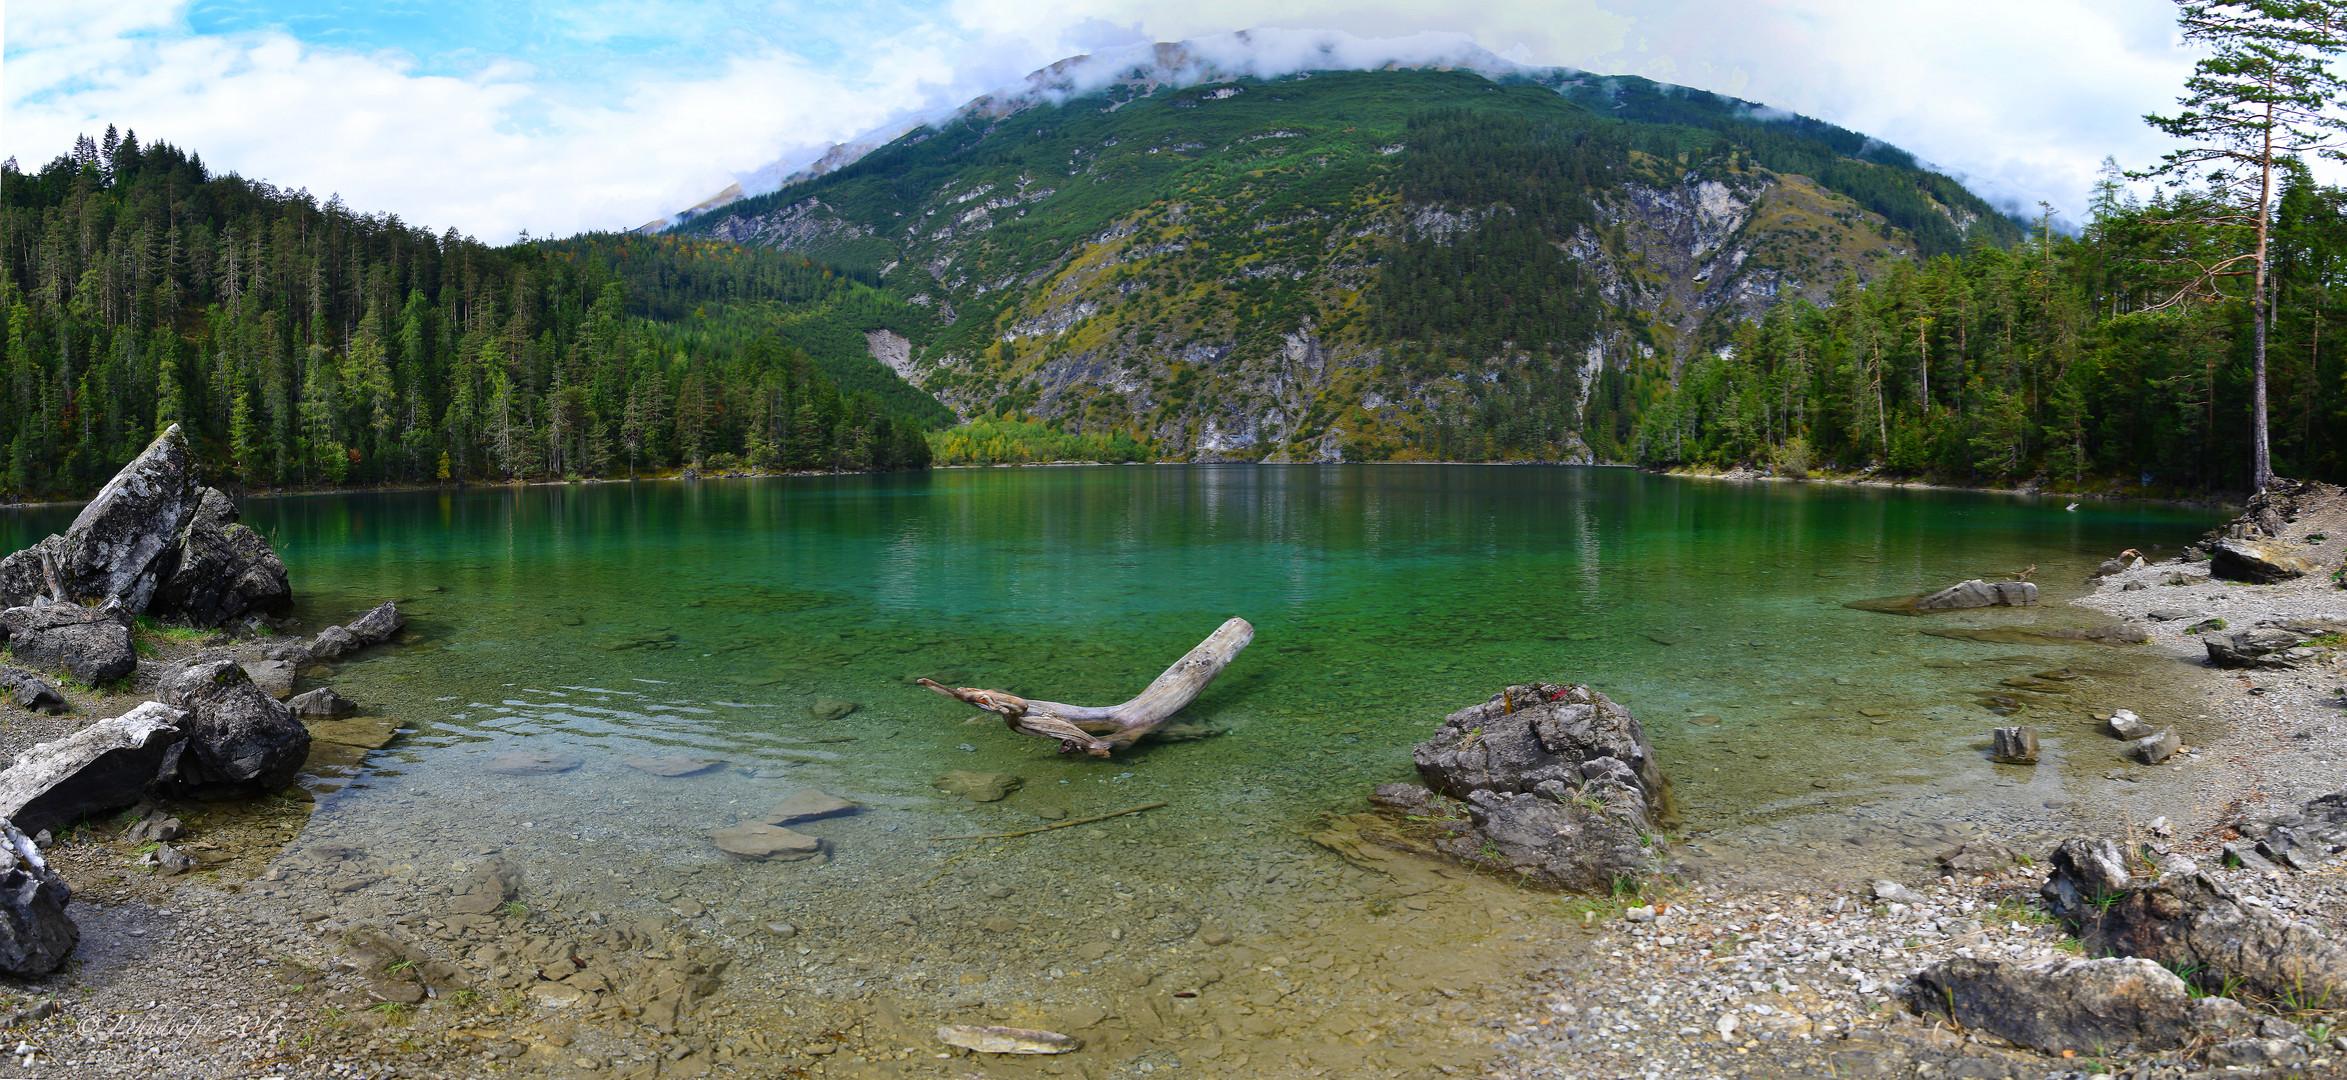 Am Blindsee in Tirol